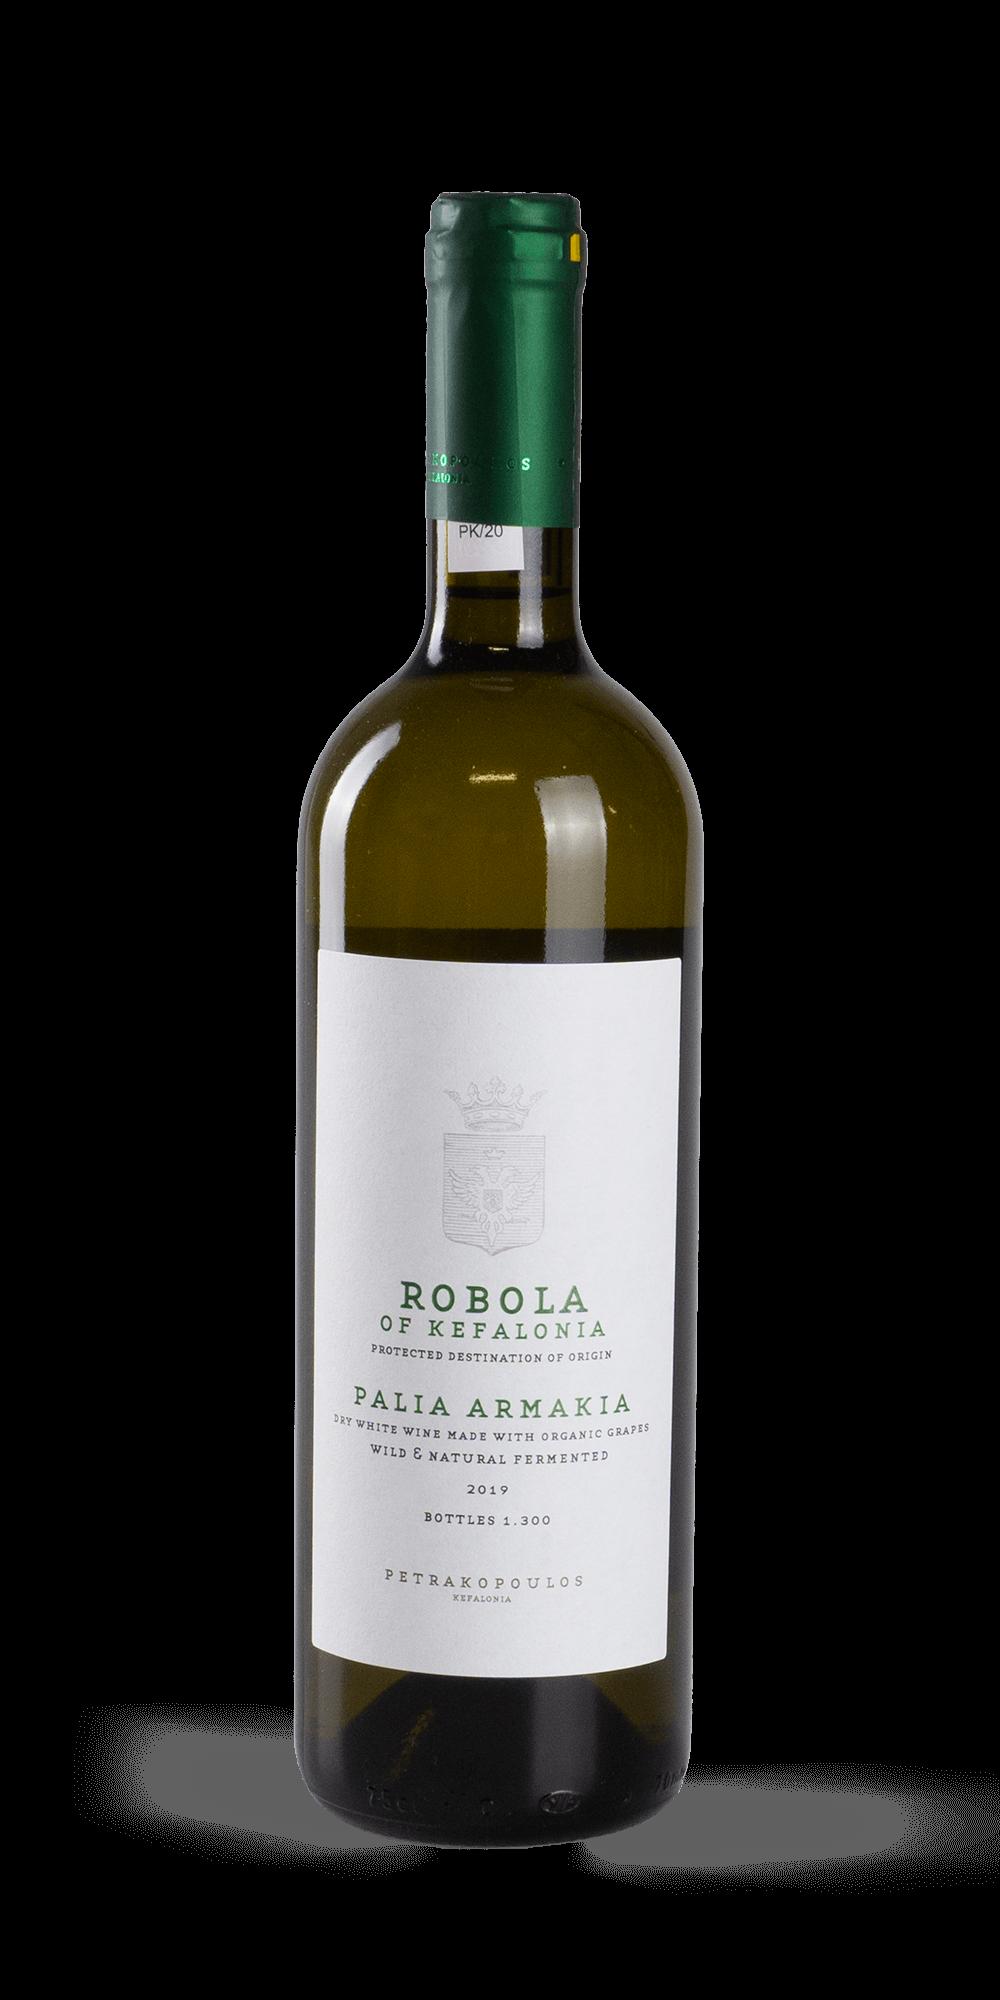 Palia Armakia BIO 2019 - Petrakopoulos Wine